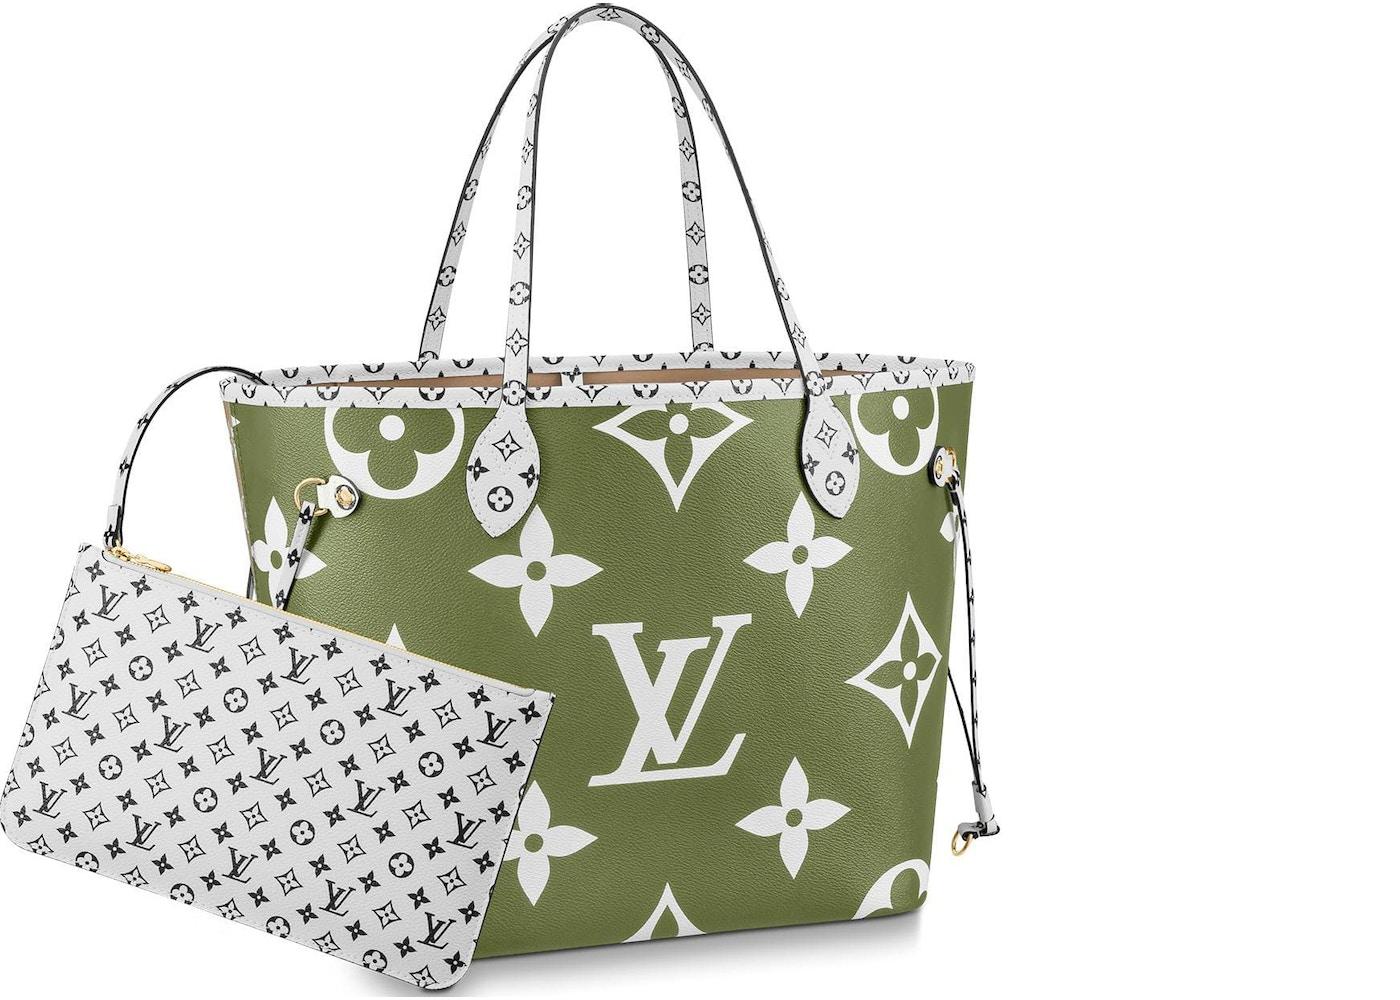 08bf8109fde Louis Vuitton Neverfull Giant Monogram MM Khaki Green/Beige